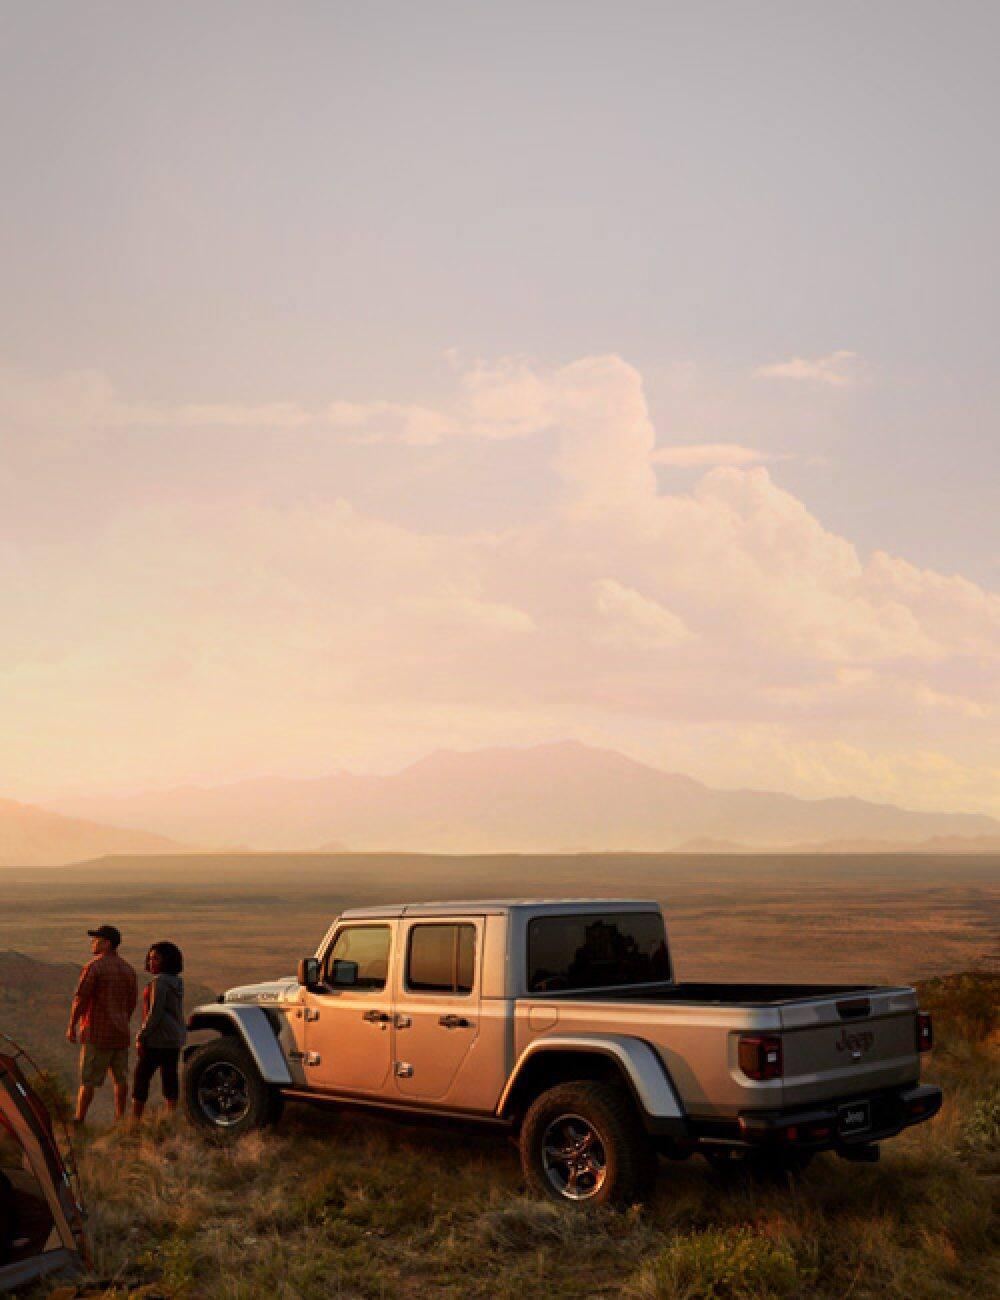 All New 2020 Jeep Gladiator Midsize Pickup Truck